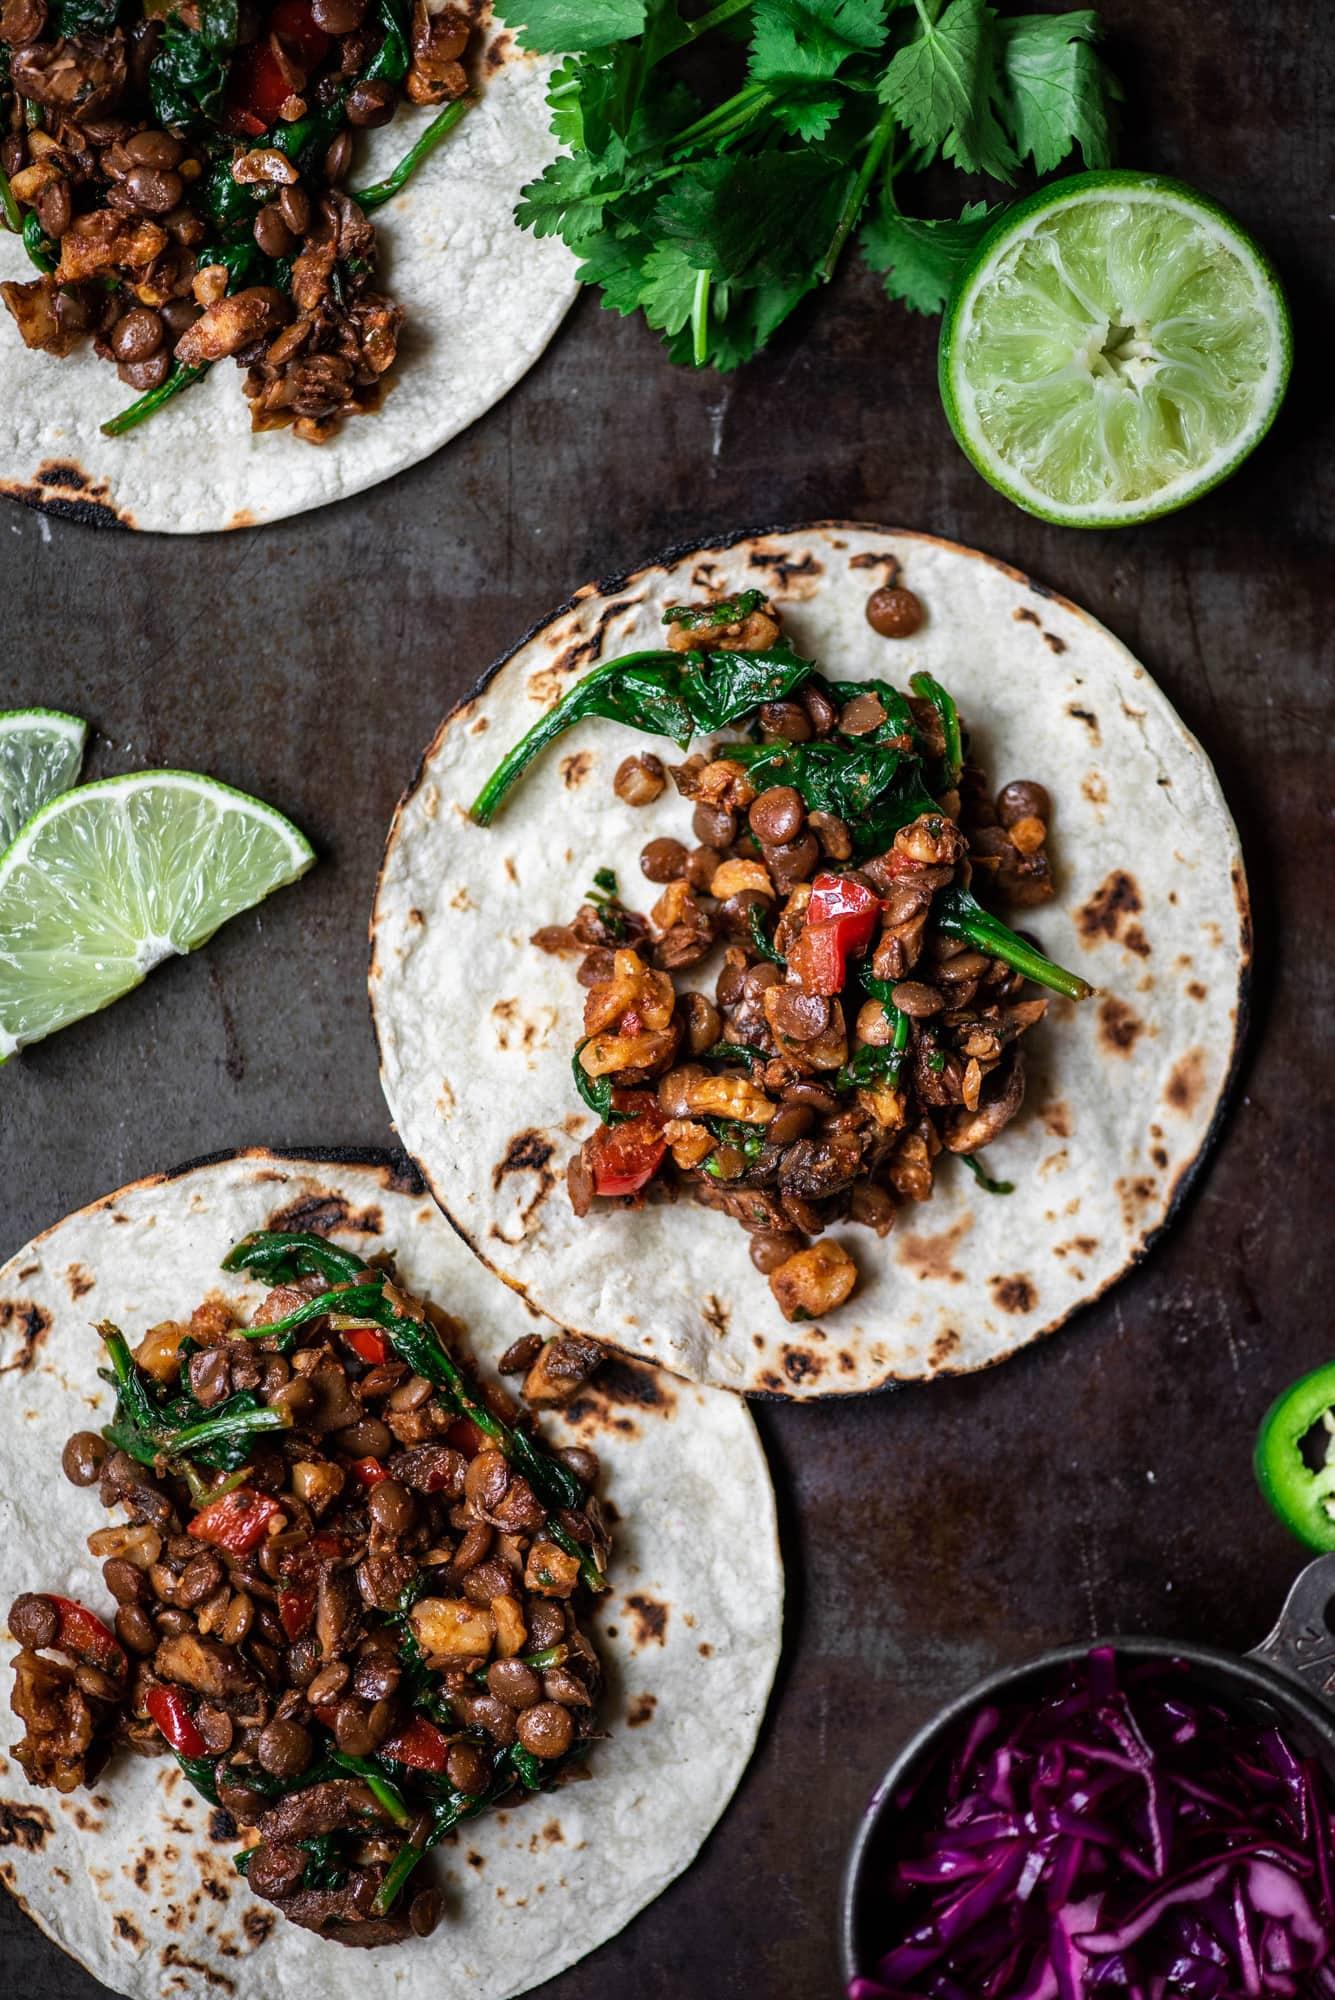 Overhead view of vegan lentil walnut tacos on tortillas